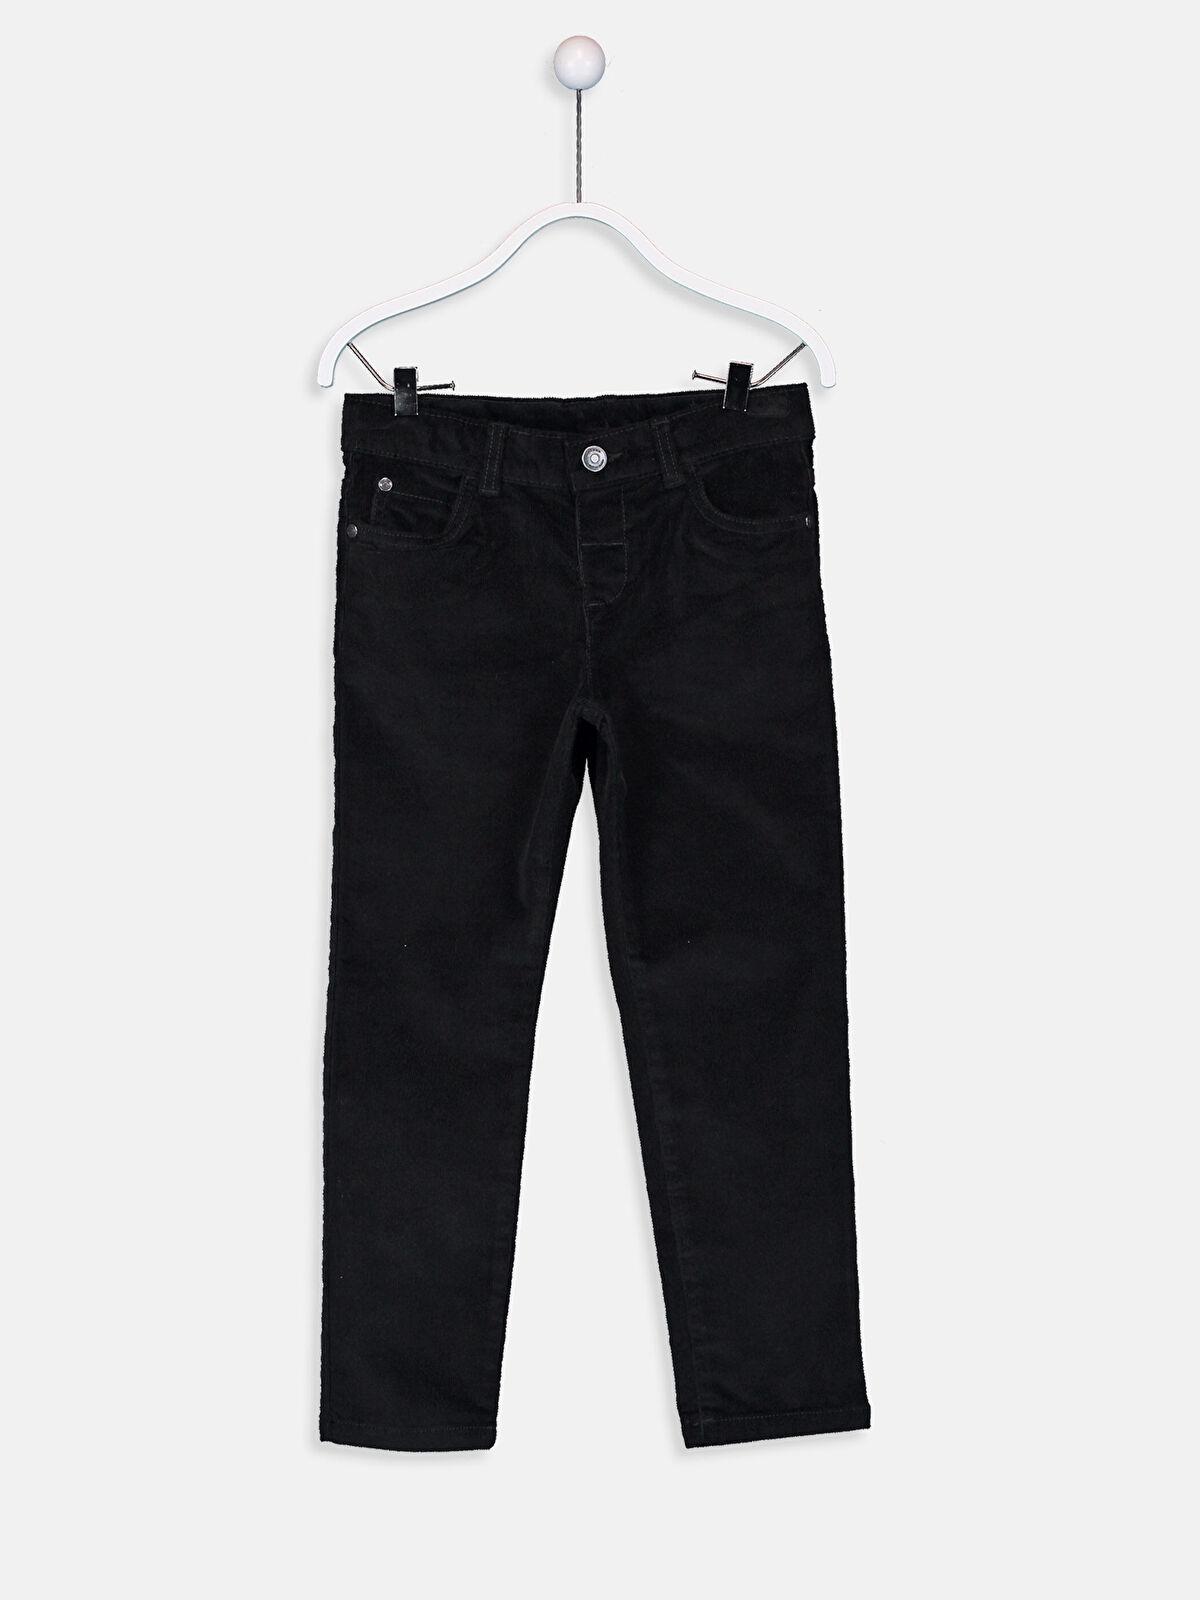 Erkek Çocuk Slim Fit Kadife Pantolon - LC WAIKIKI